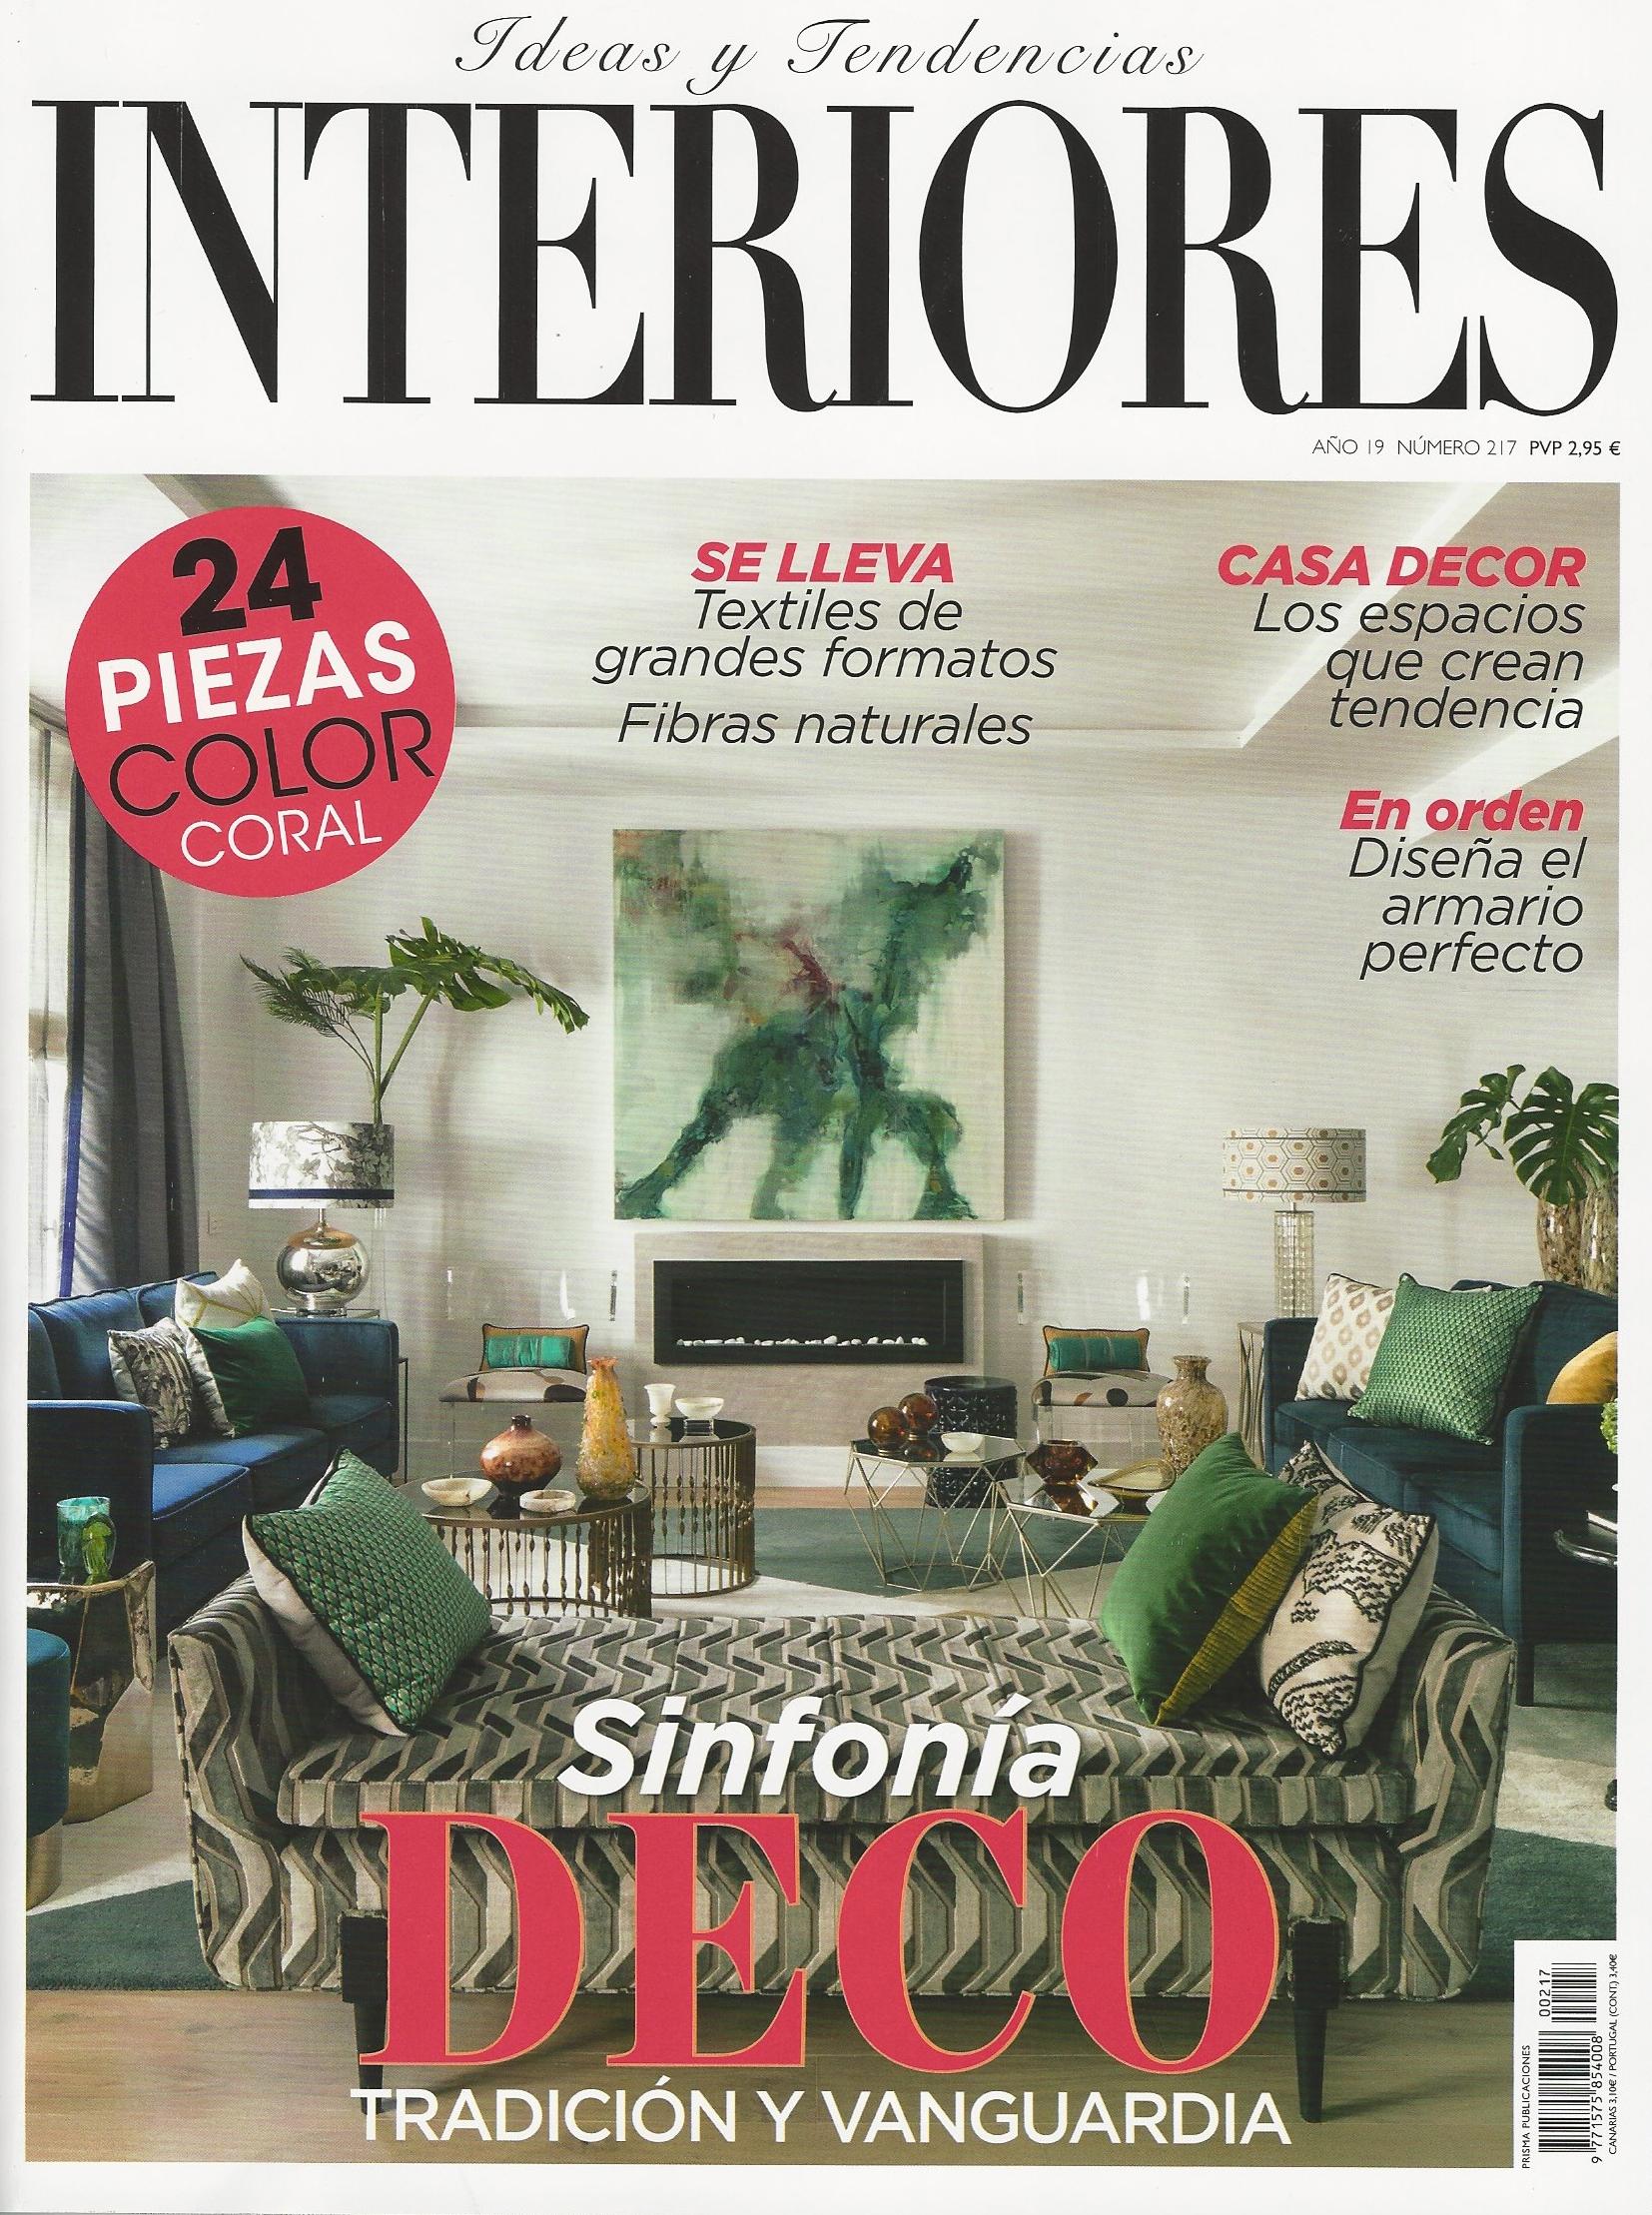 Interiores Magazine, March 2019